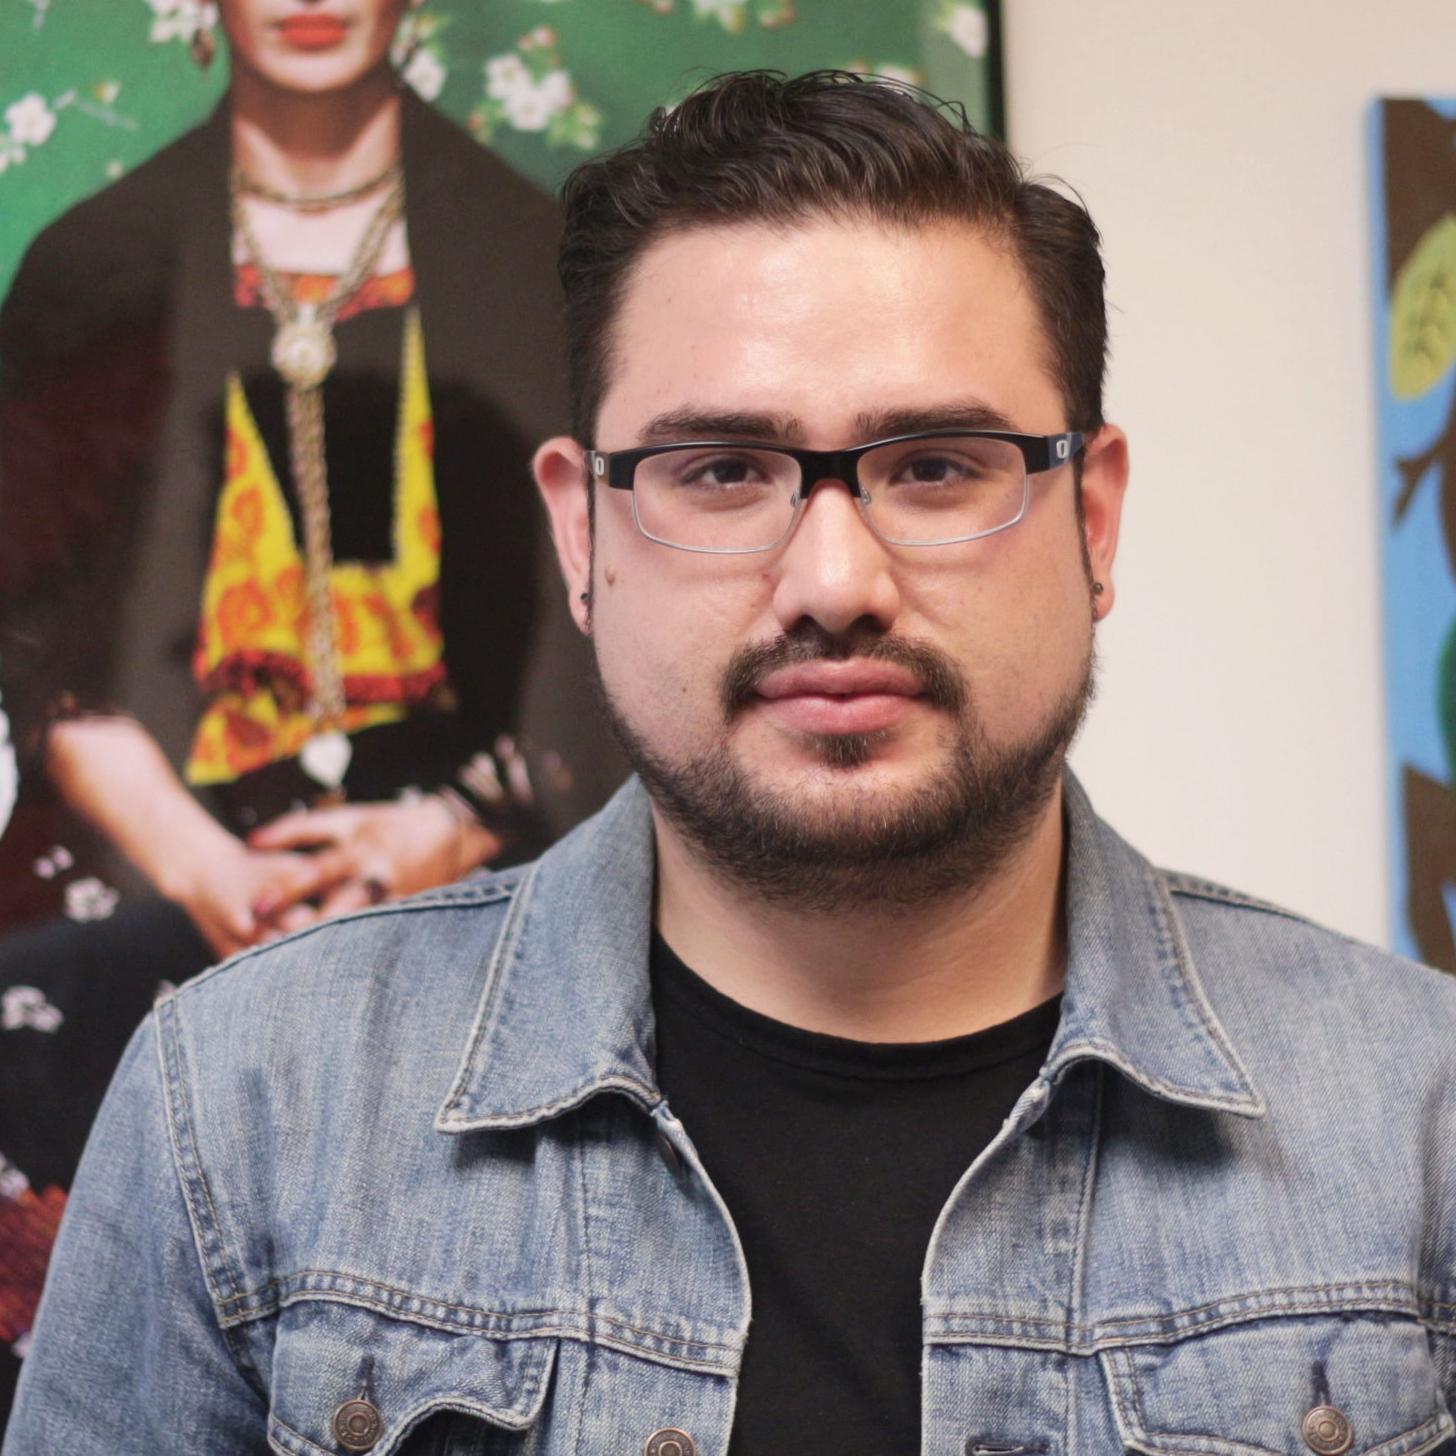 Christian Lozano-Cuellar